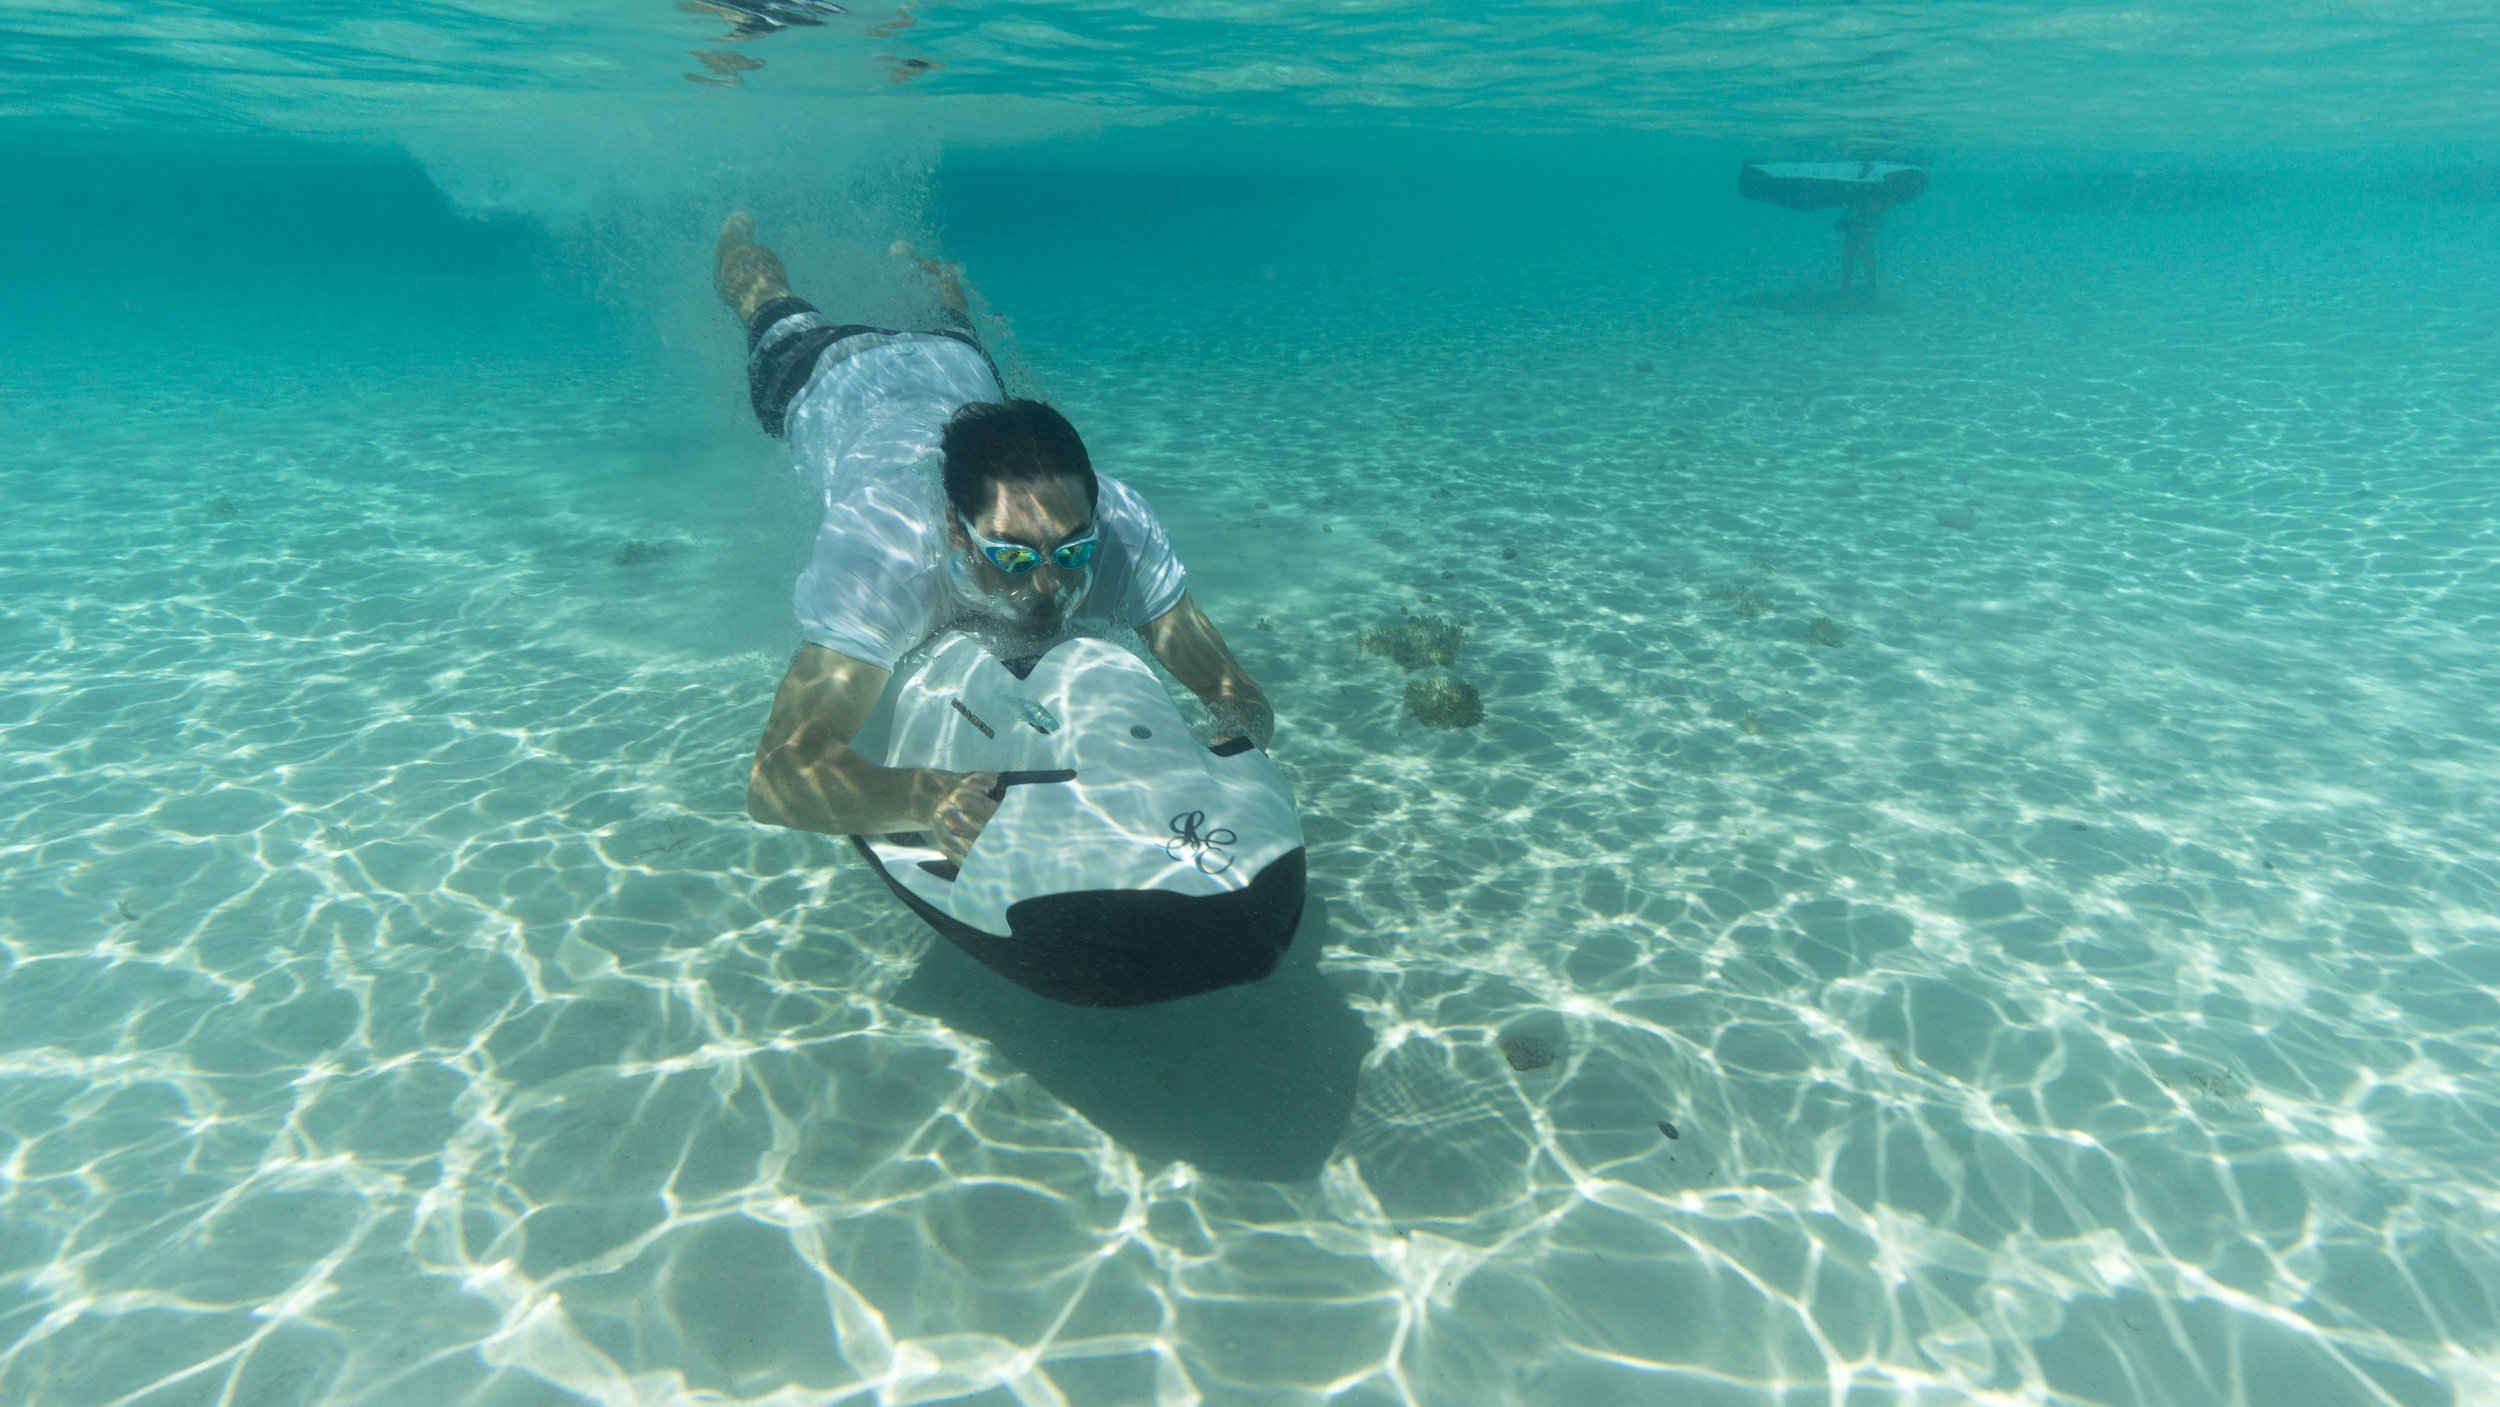 jason-decaires-taylor-Atlas-Yacht-sweet-escape-charter-dive-snorkle-activities-destinations-bahamas-luxury-eco-tourism-mdermaid-copperfield-rudder-cut-cay-exuma-sea-bobs